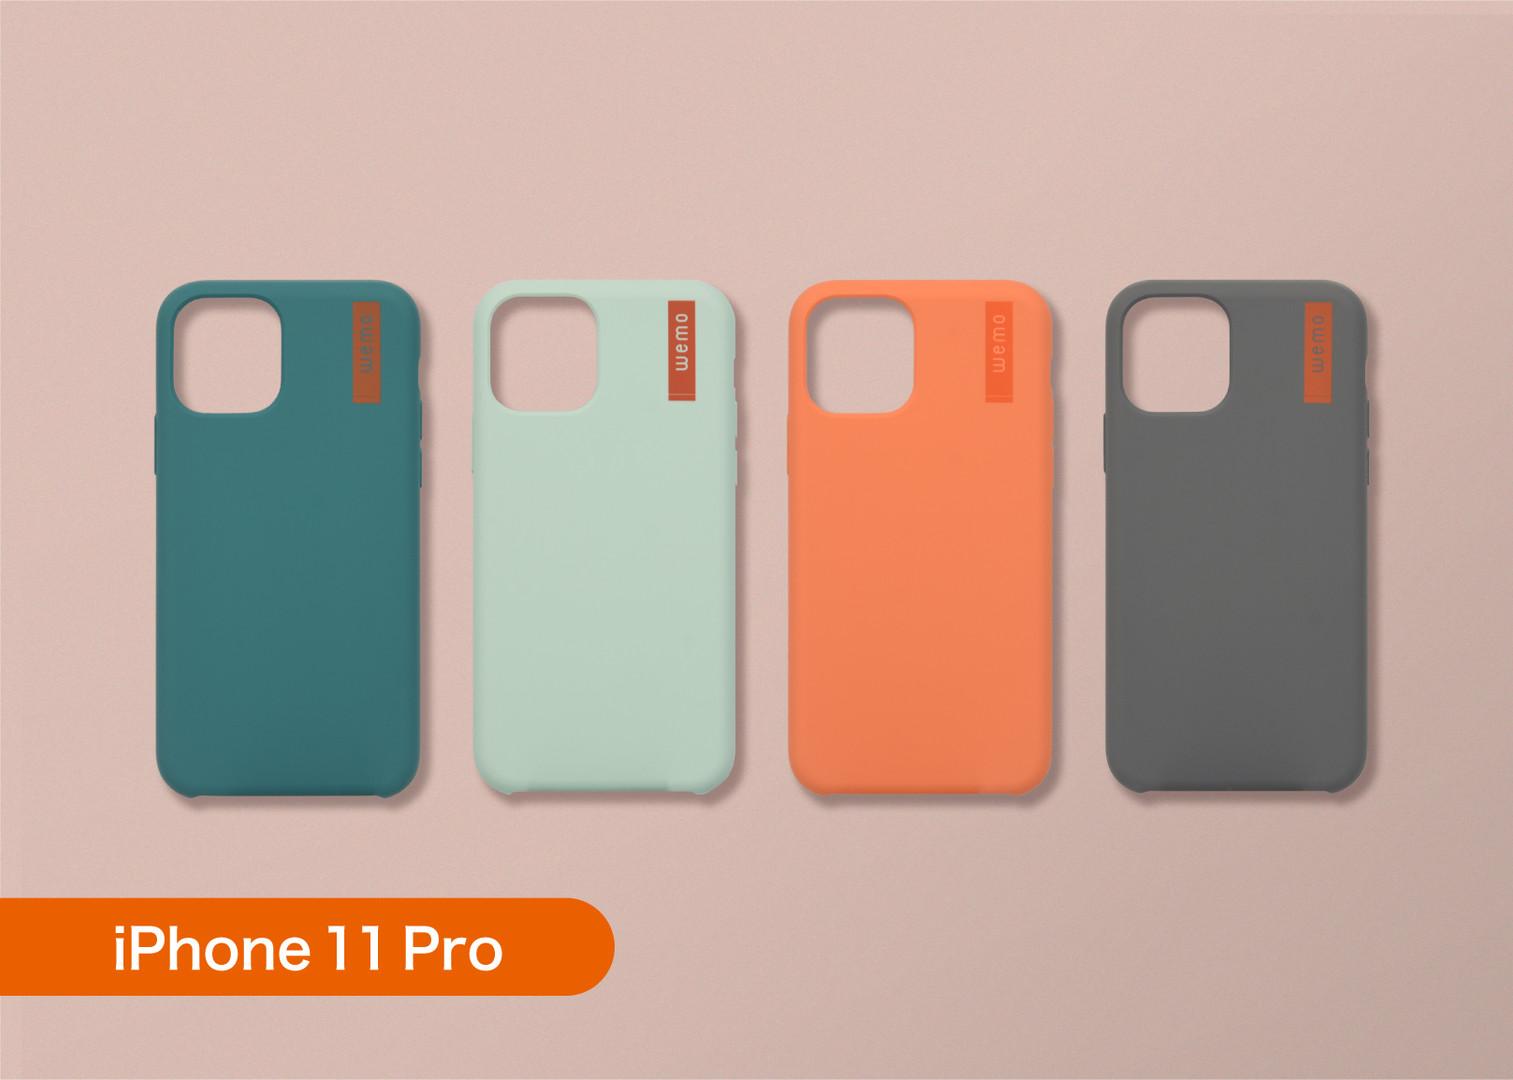 03_product_11pro.jpg